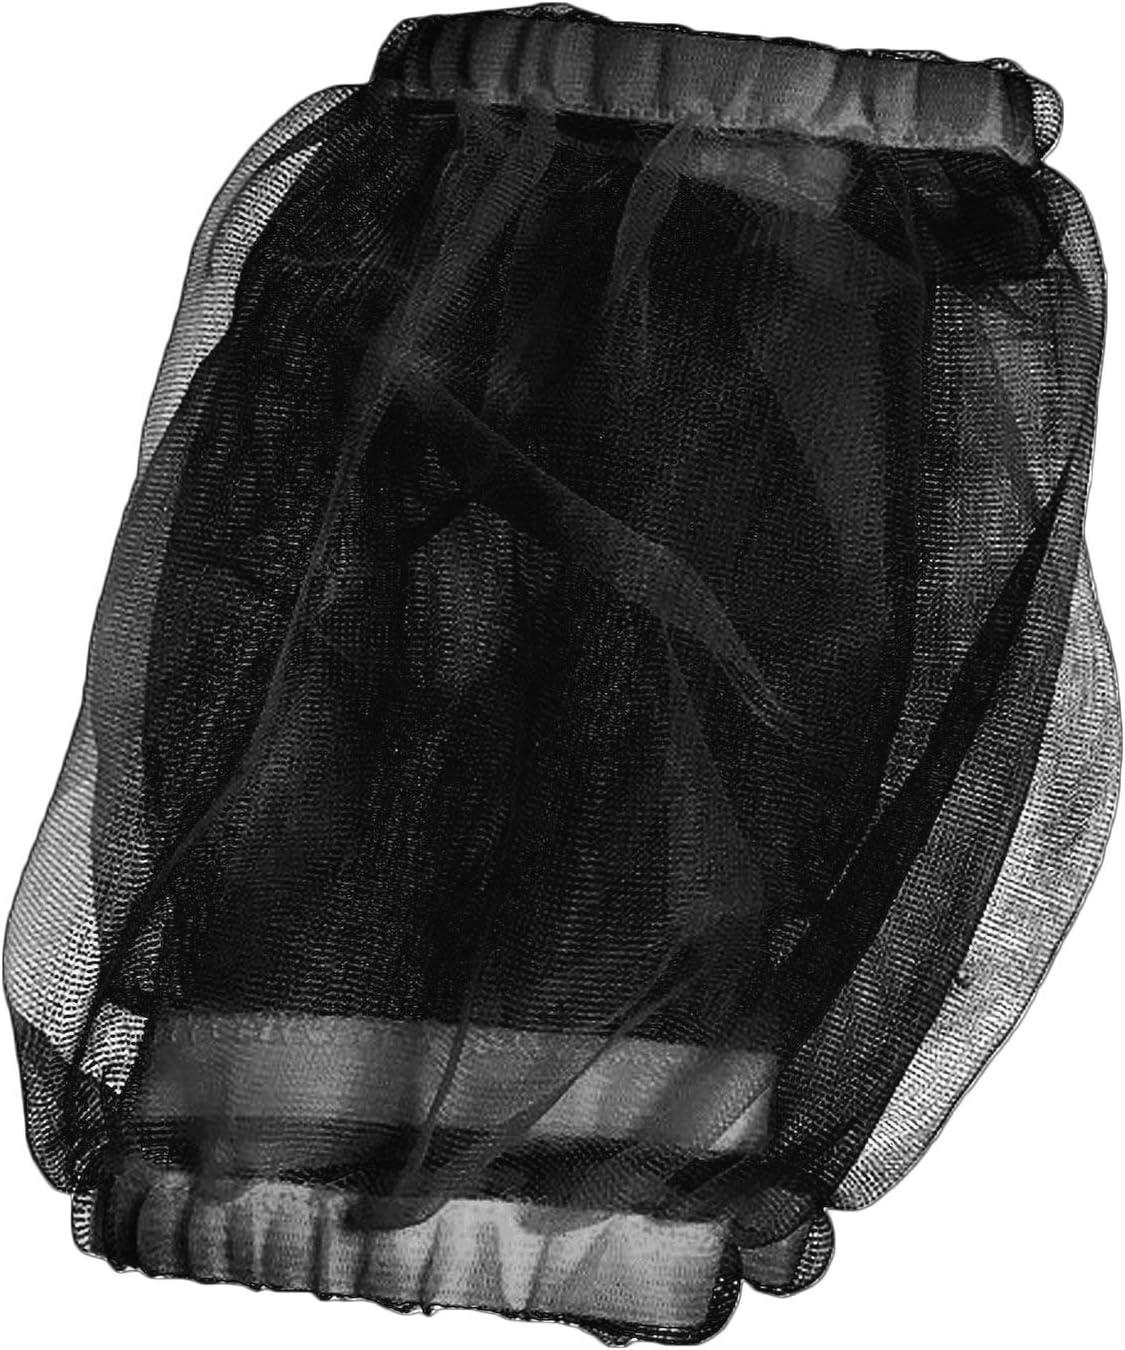 Yummum - Cubierta de malla de nailon para pájaros, diseño de jaula de pájaros